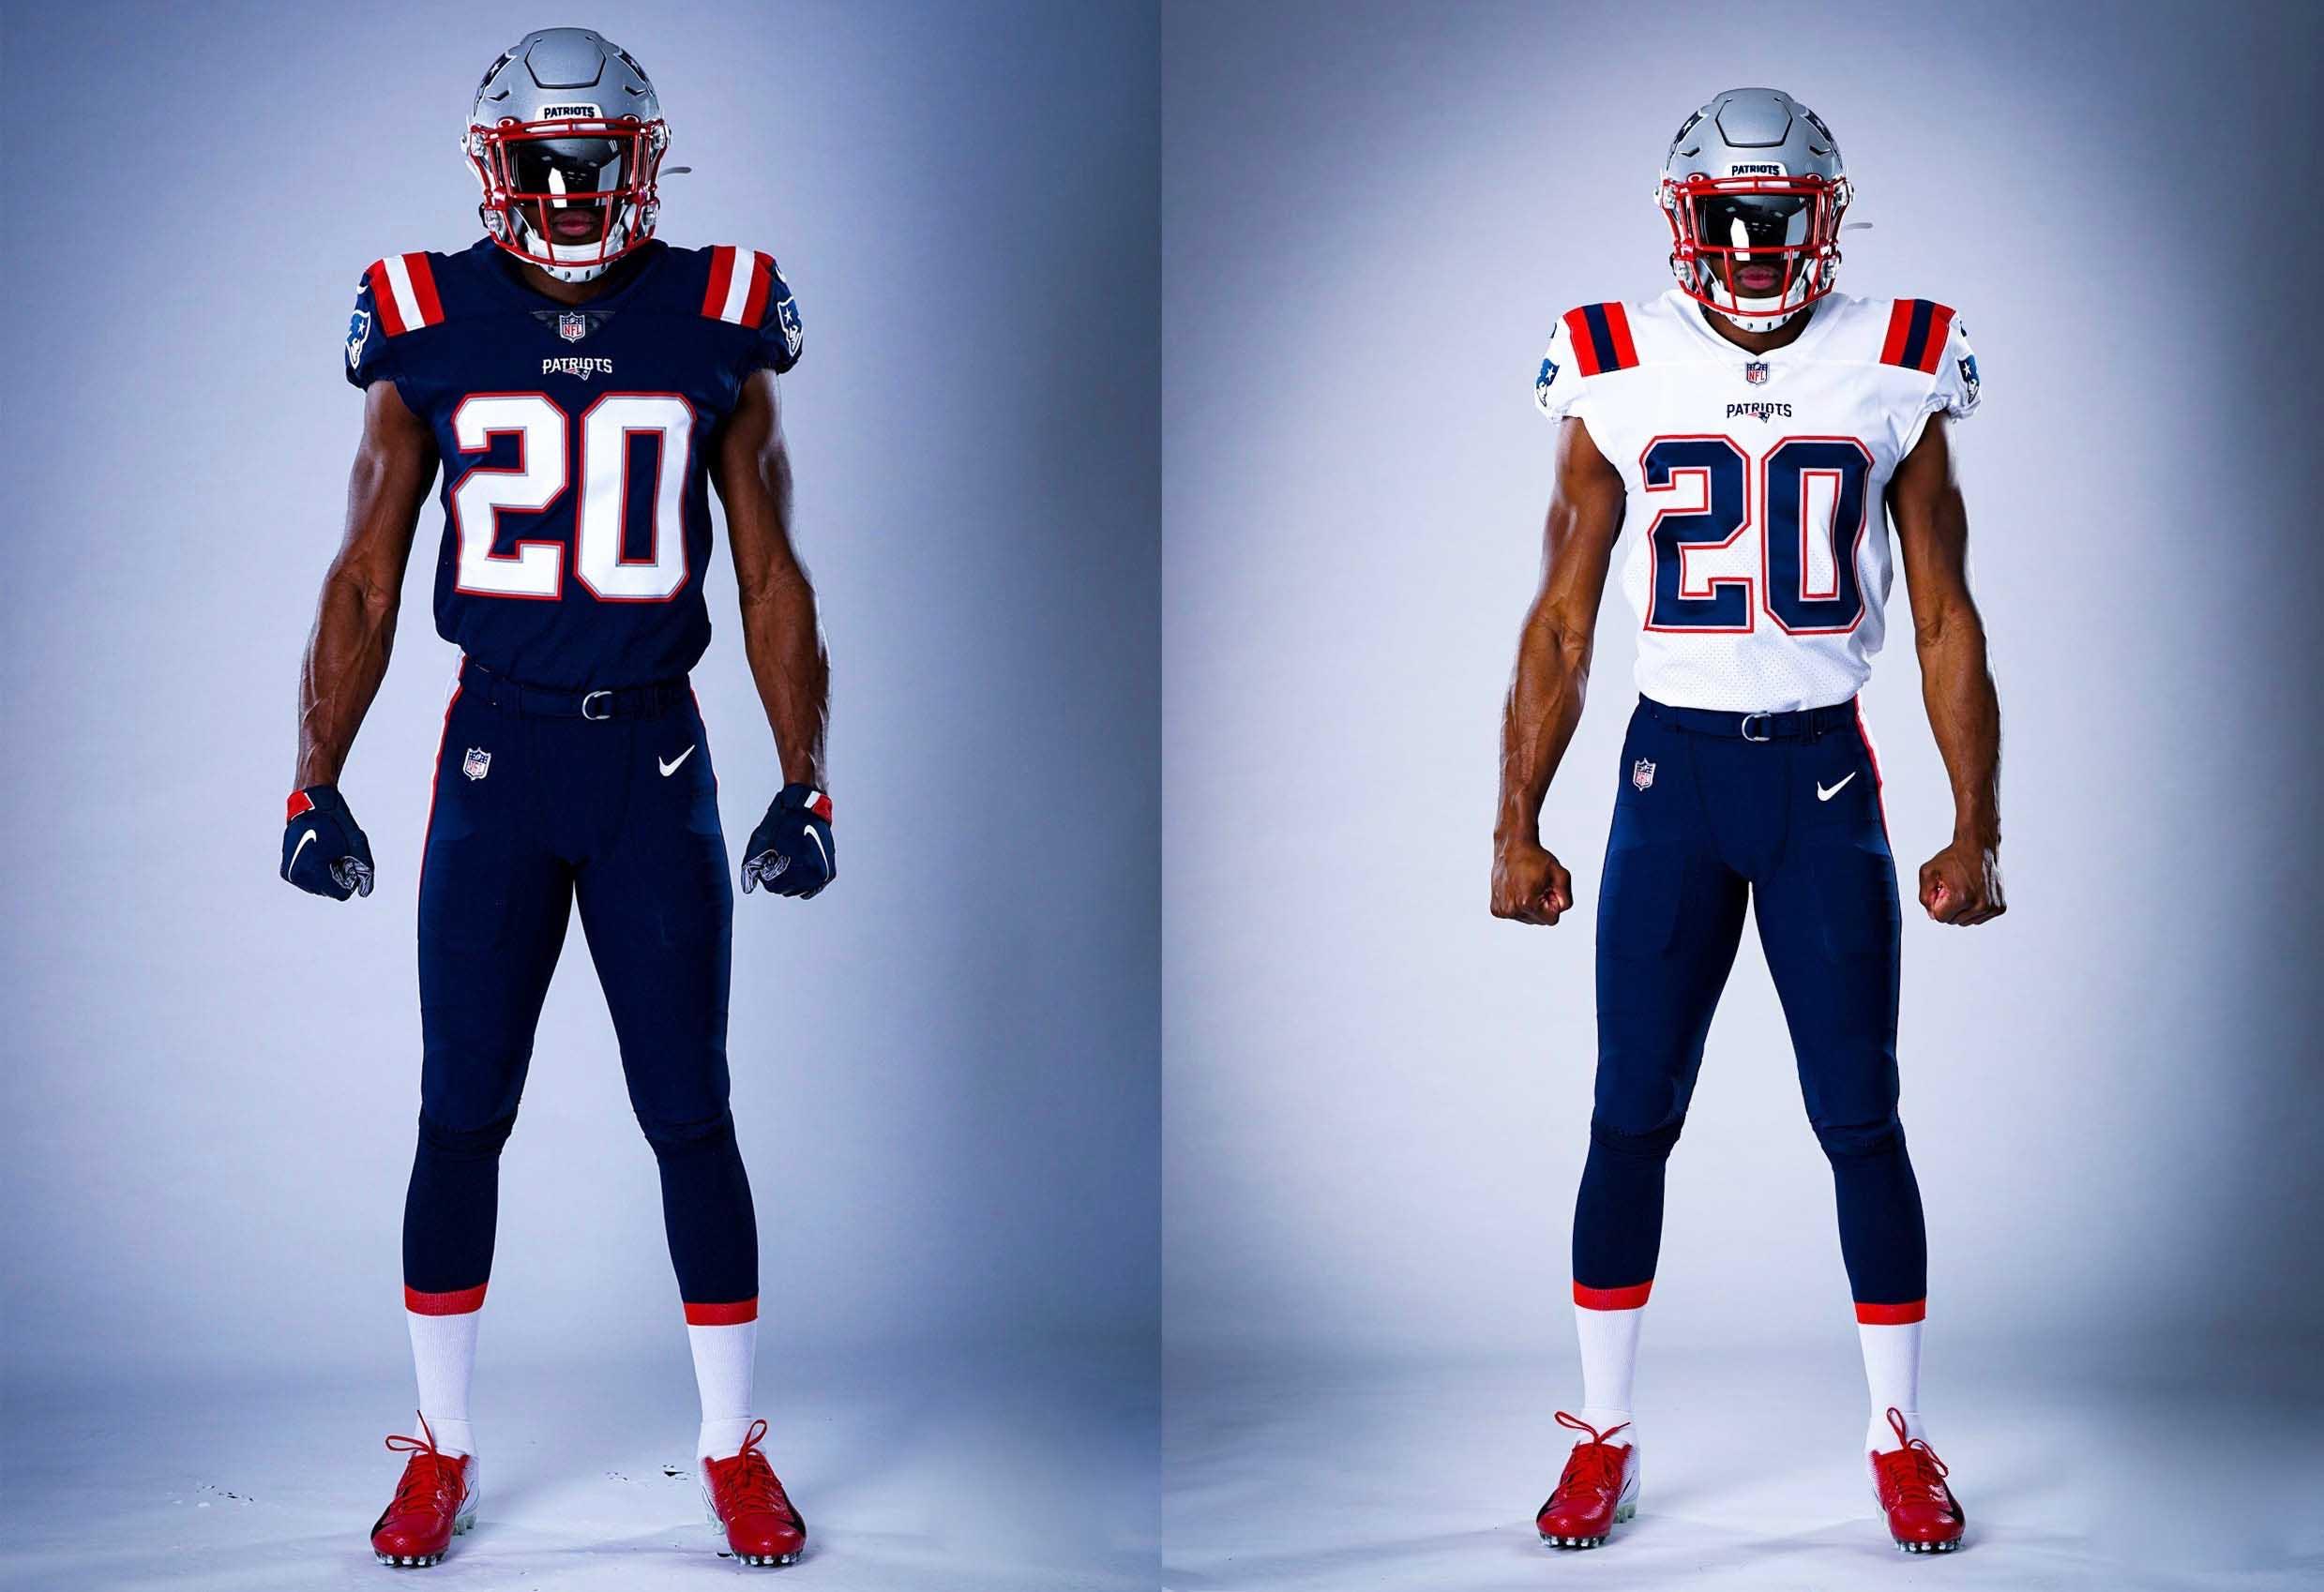 new england patriots uniforms 2020